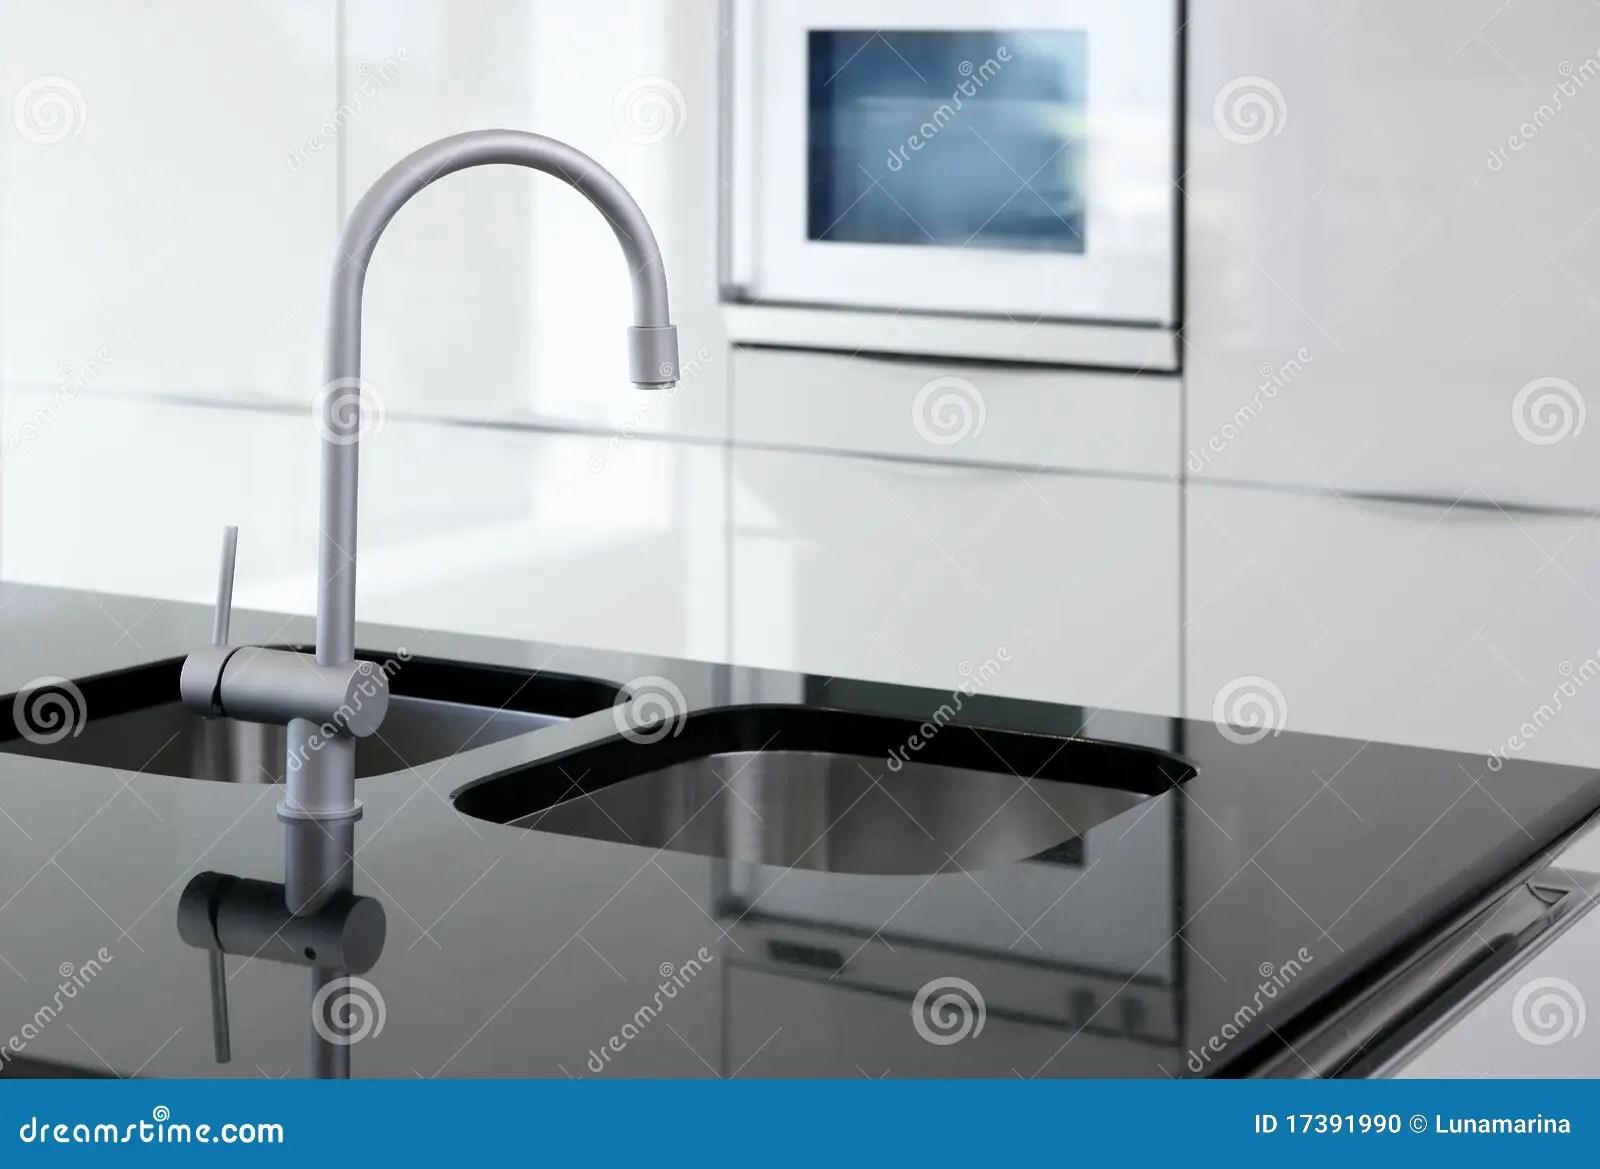 black faucet kitchen modular cabinets 黑色龙头厨房现代烤箱白色库存照片 图片包括有住房 拱道 集成 豪华 黑色龙头厨房现代烤箱白色